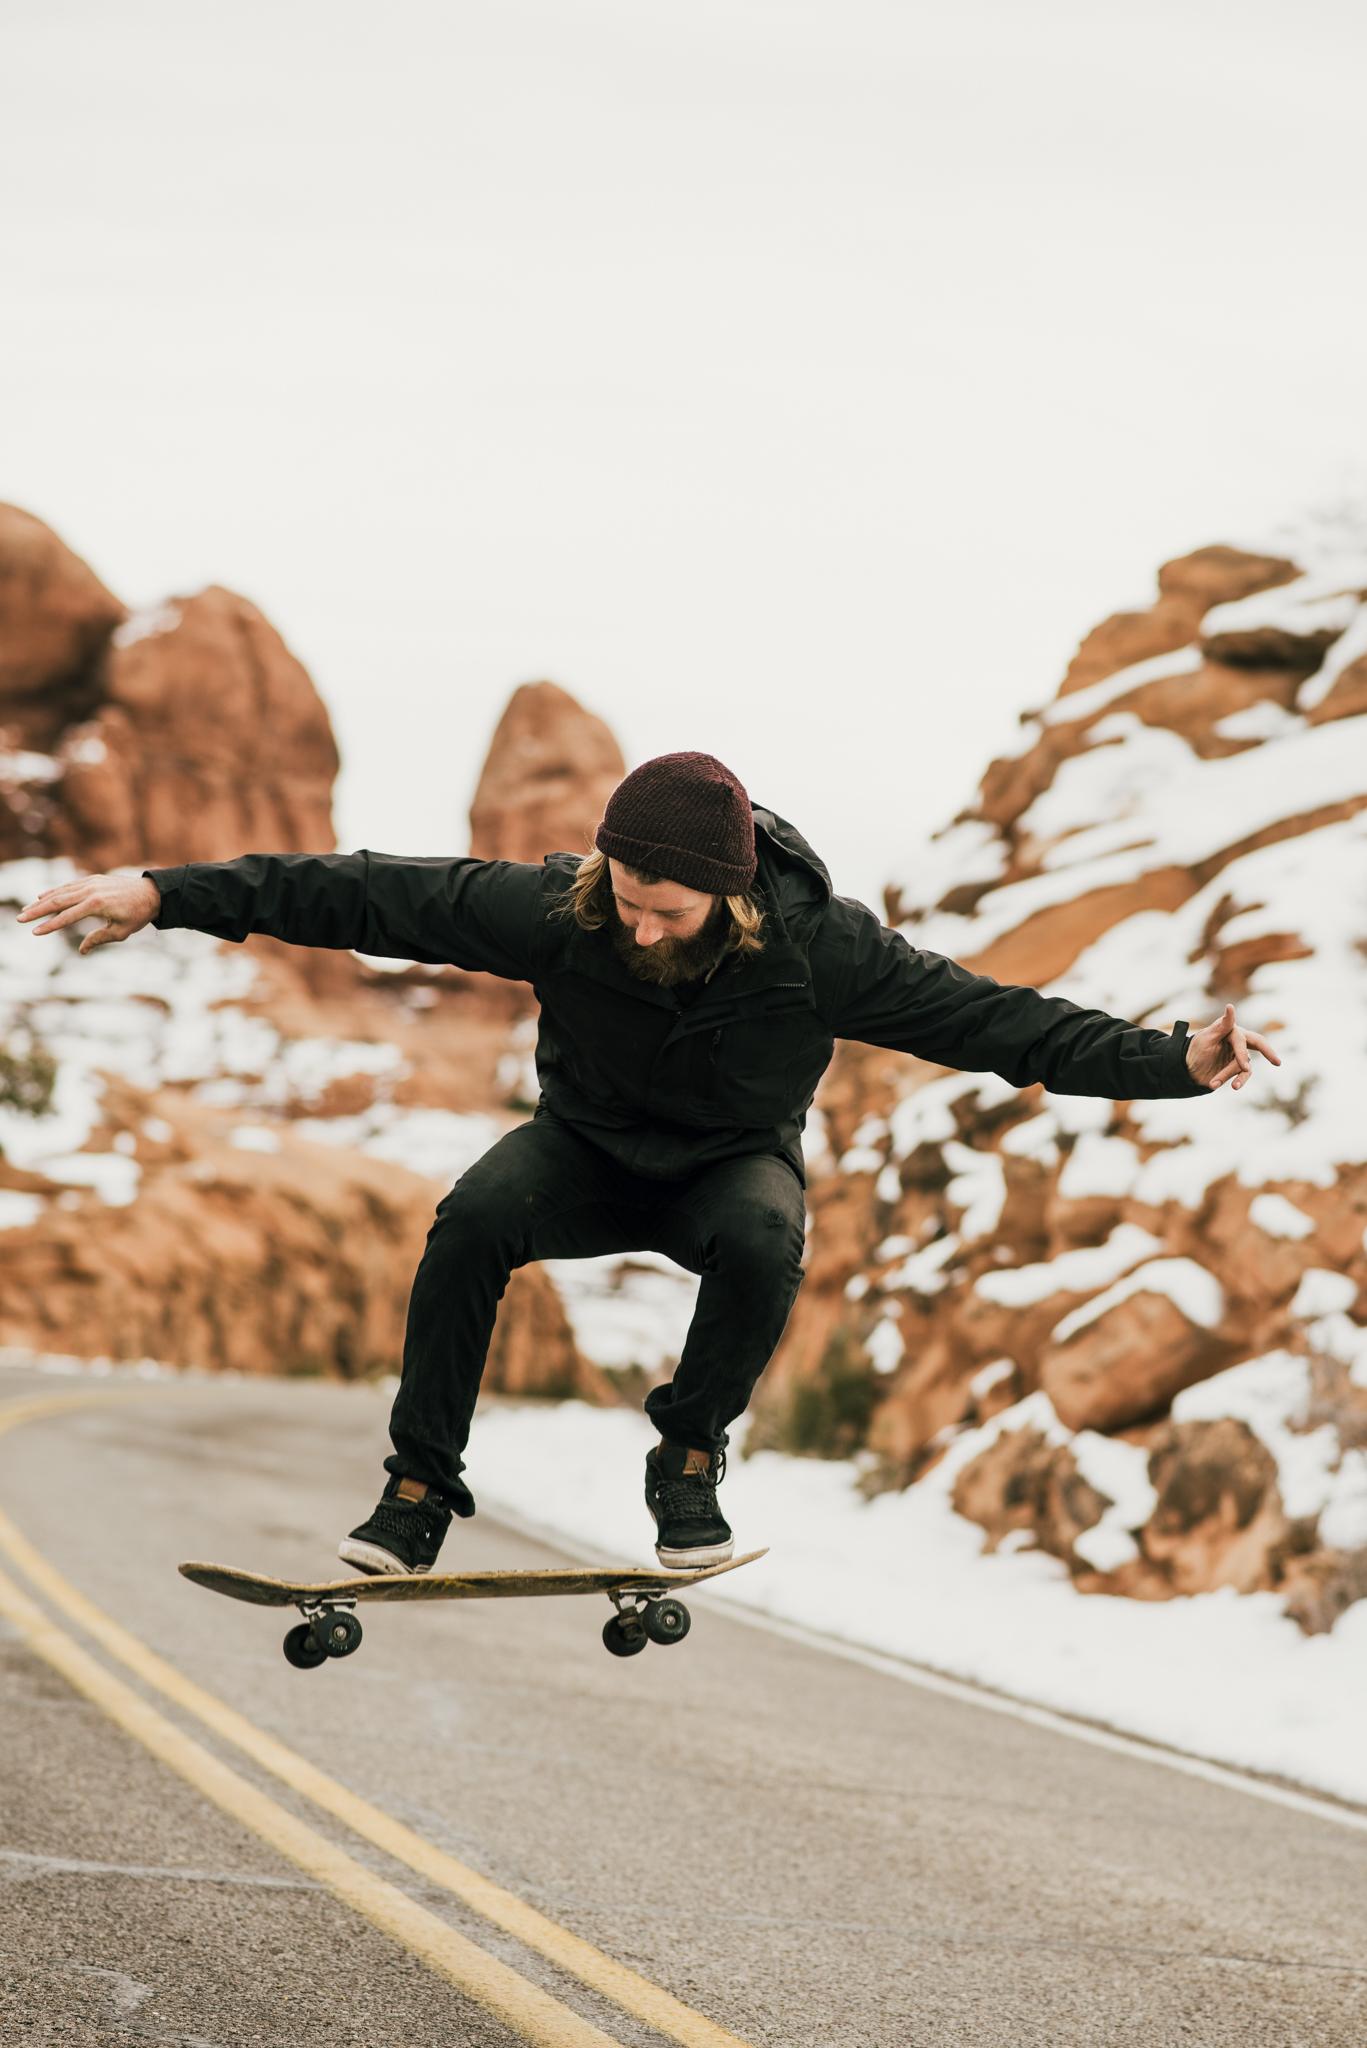 ©The-Ryans-Photography---Arches-National-Park-Moab-Utah-Travel-023.jpg